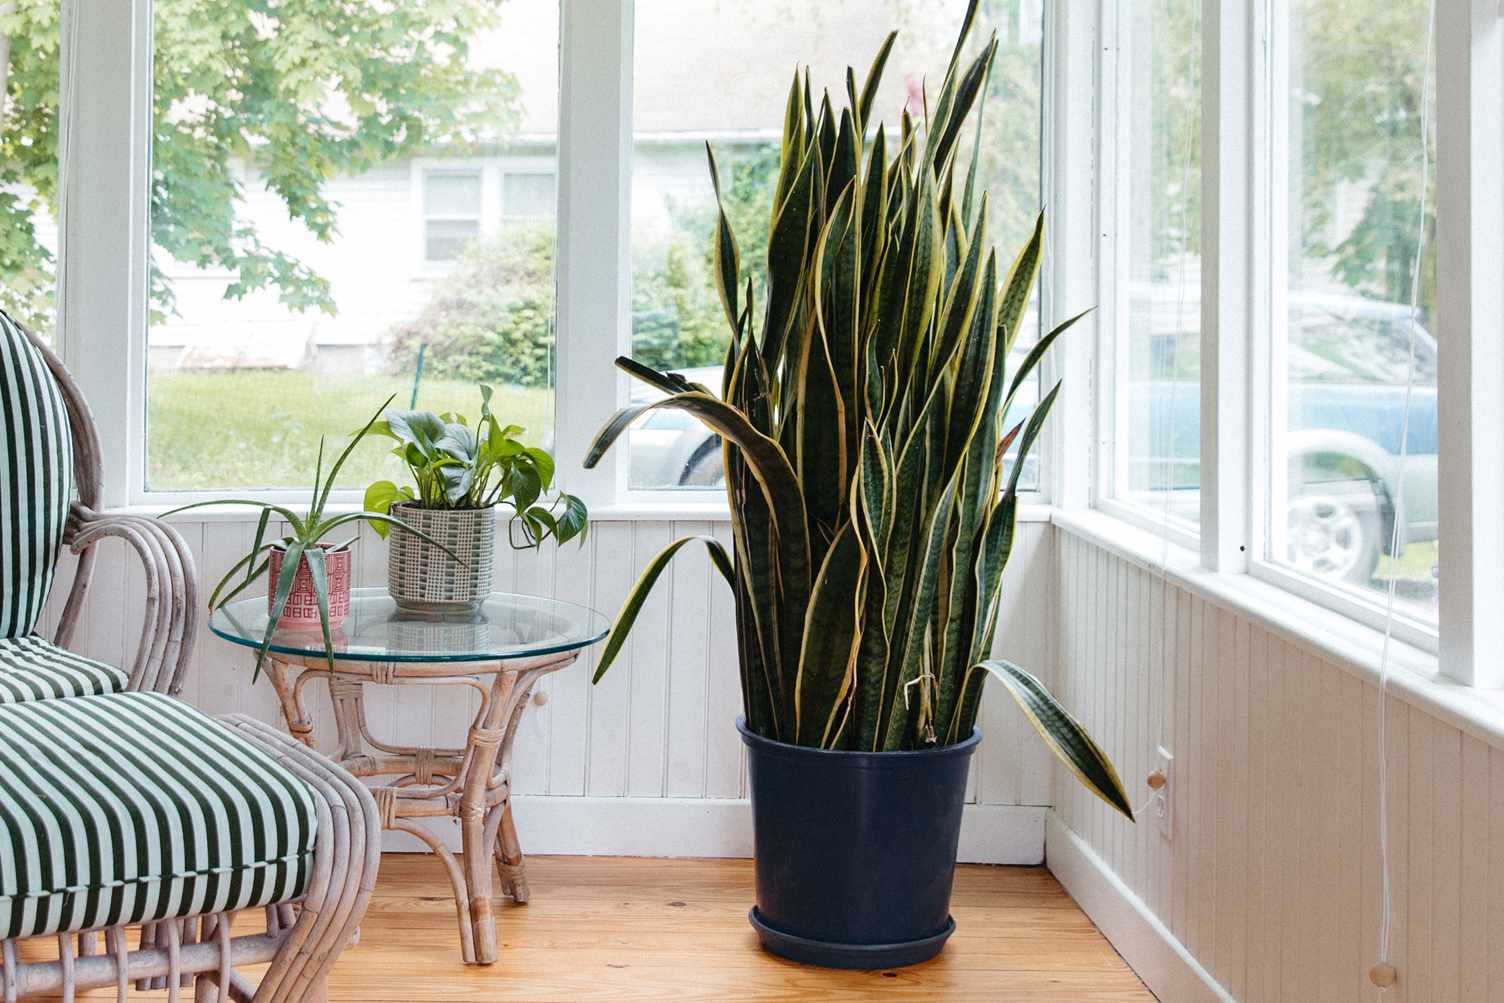 Mother in law's tongue plant in dark blue pot in corner of sunroom